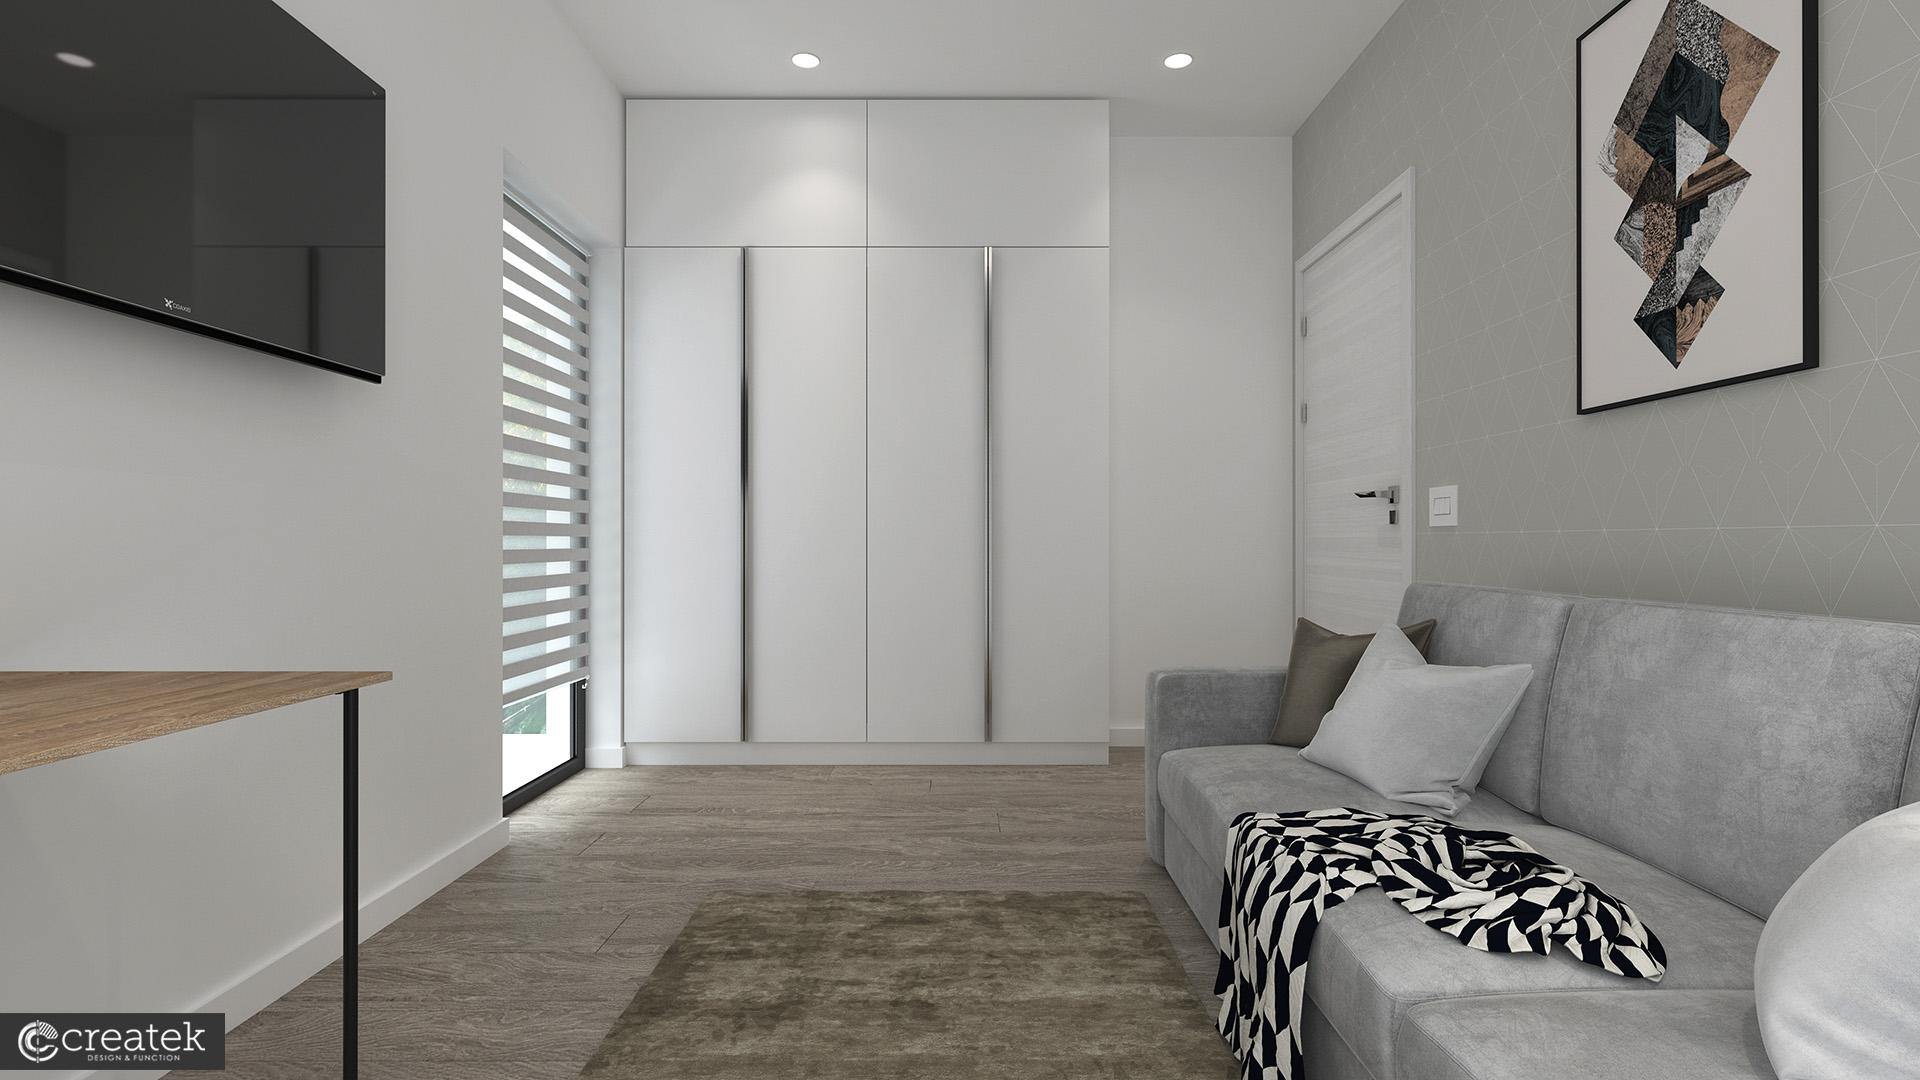 045-Dormitor-Oaspeti-Interior-Casa-Ovidiu-Lac